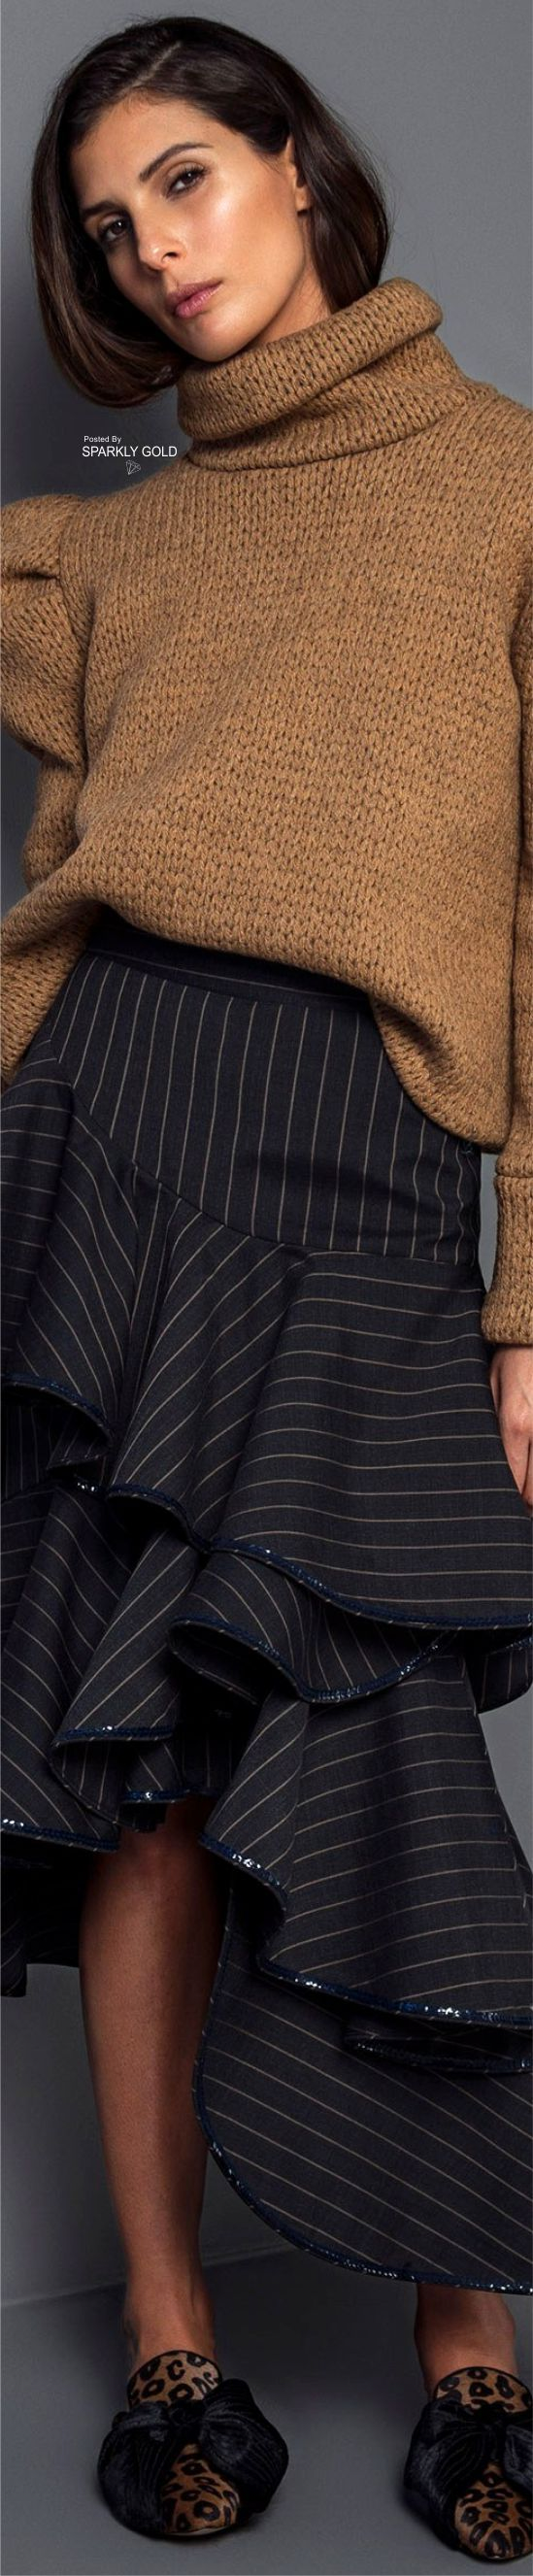 Johanna Ortiz F-17 RTW: turtleneck sweater, ruffled striped skirt, leopard shoes.